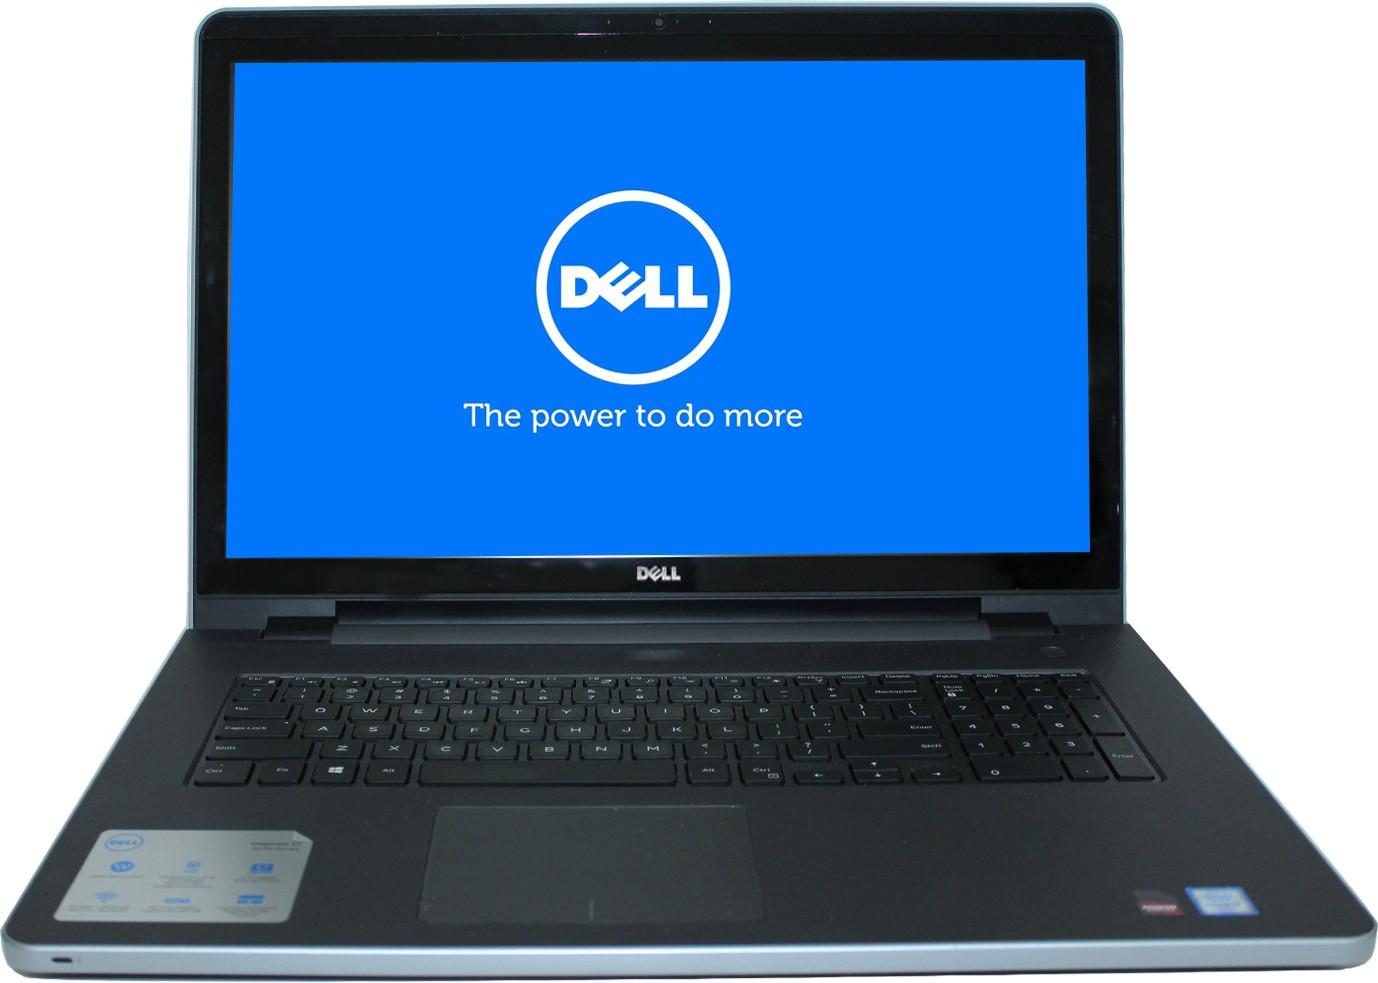 Dell Inspiration Core i7 6th Gen i5759-8247SLV Laptop Image